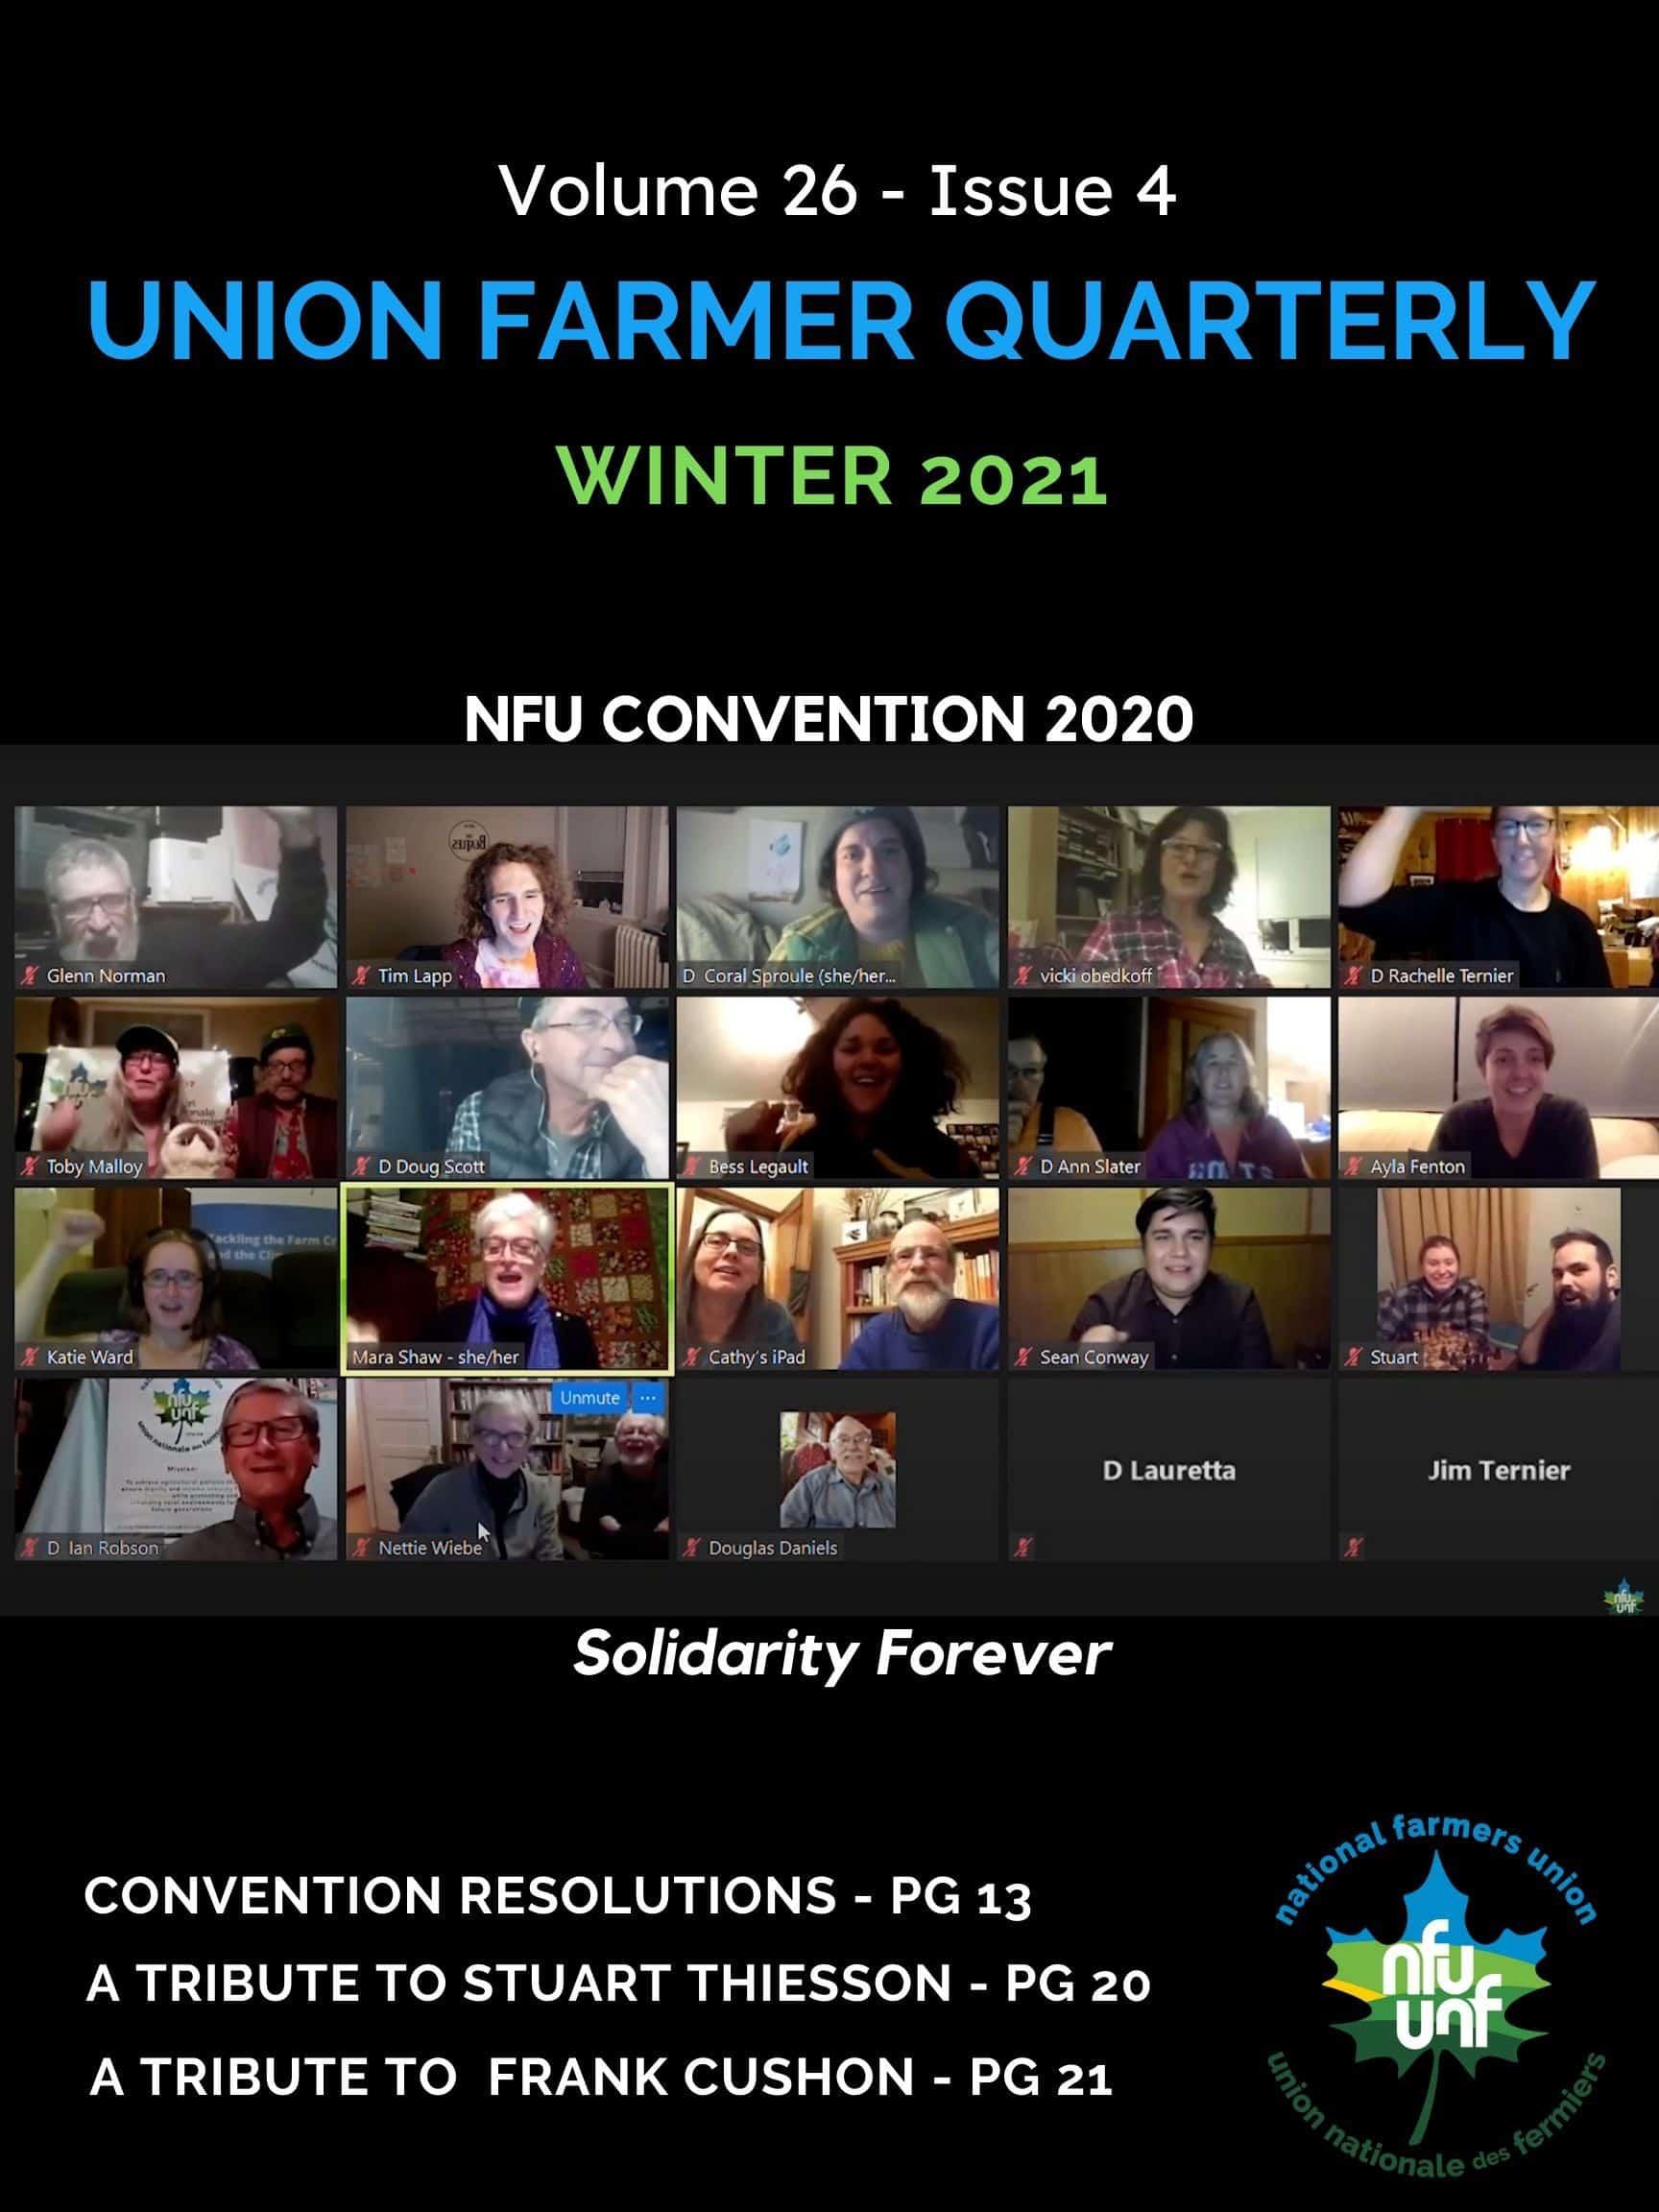 Union Farmer Quarterly:  Winter 2021